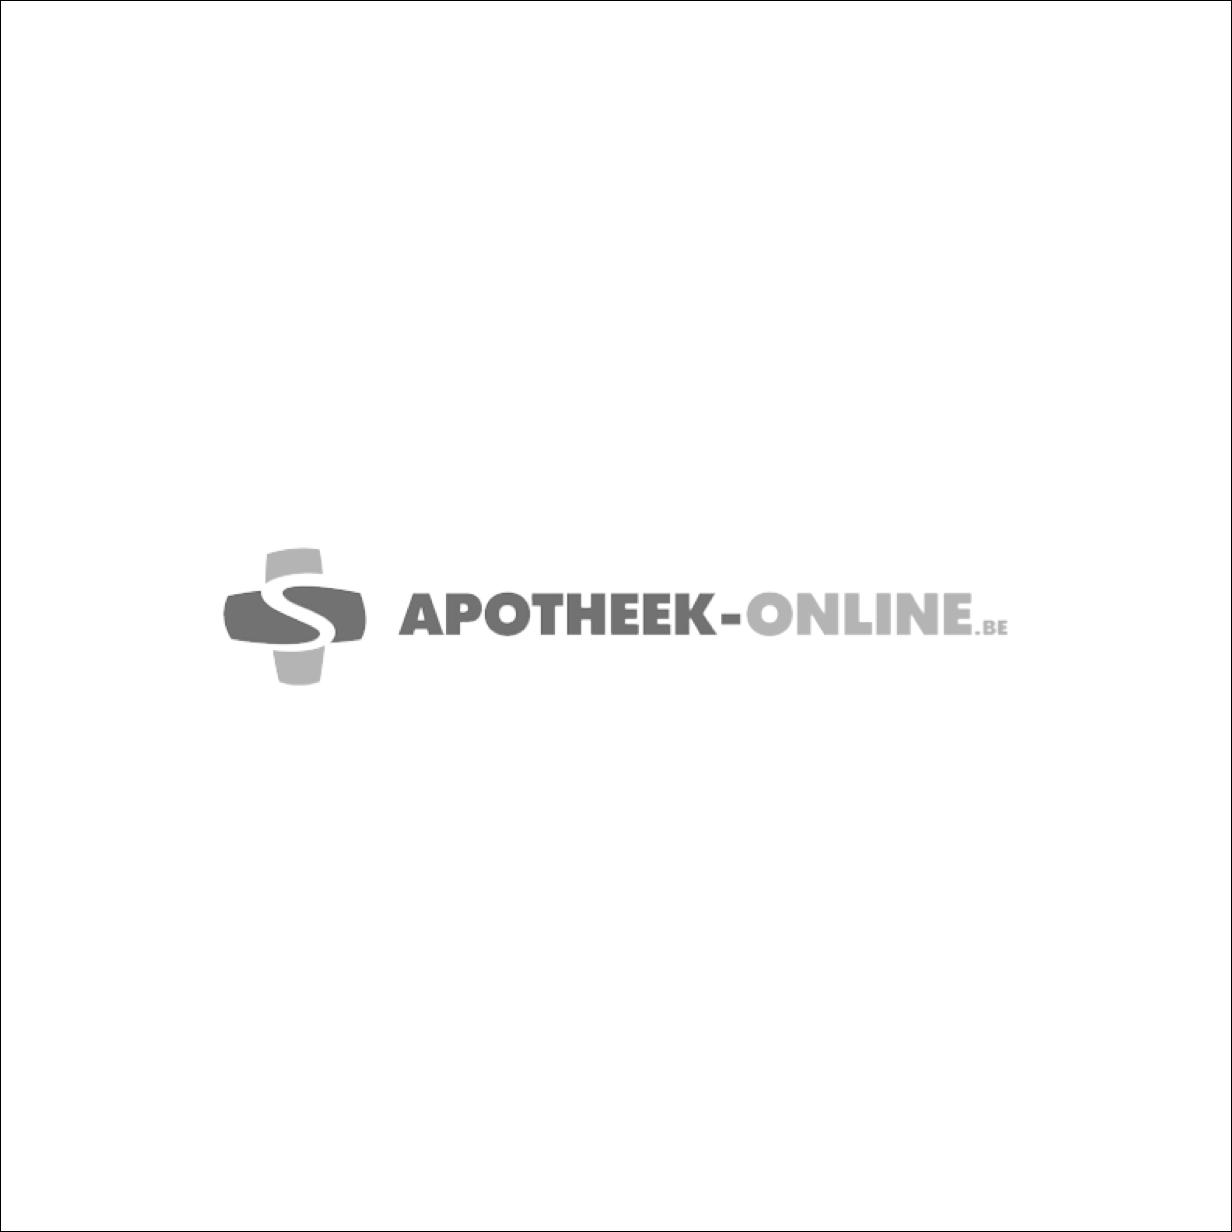 Mollelast Haft Bande Elast Adh 6cmx20m 30069